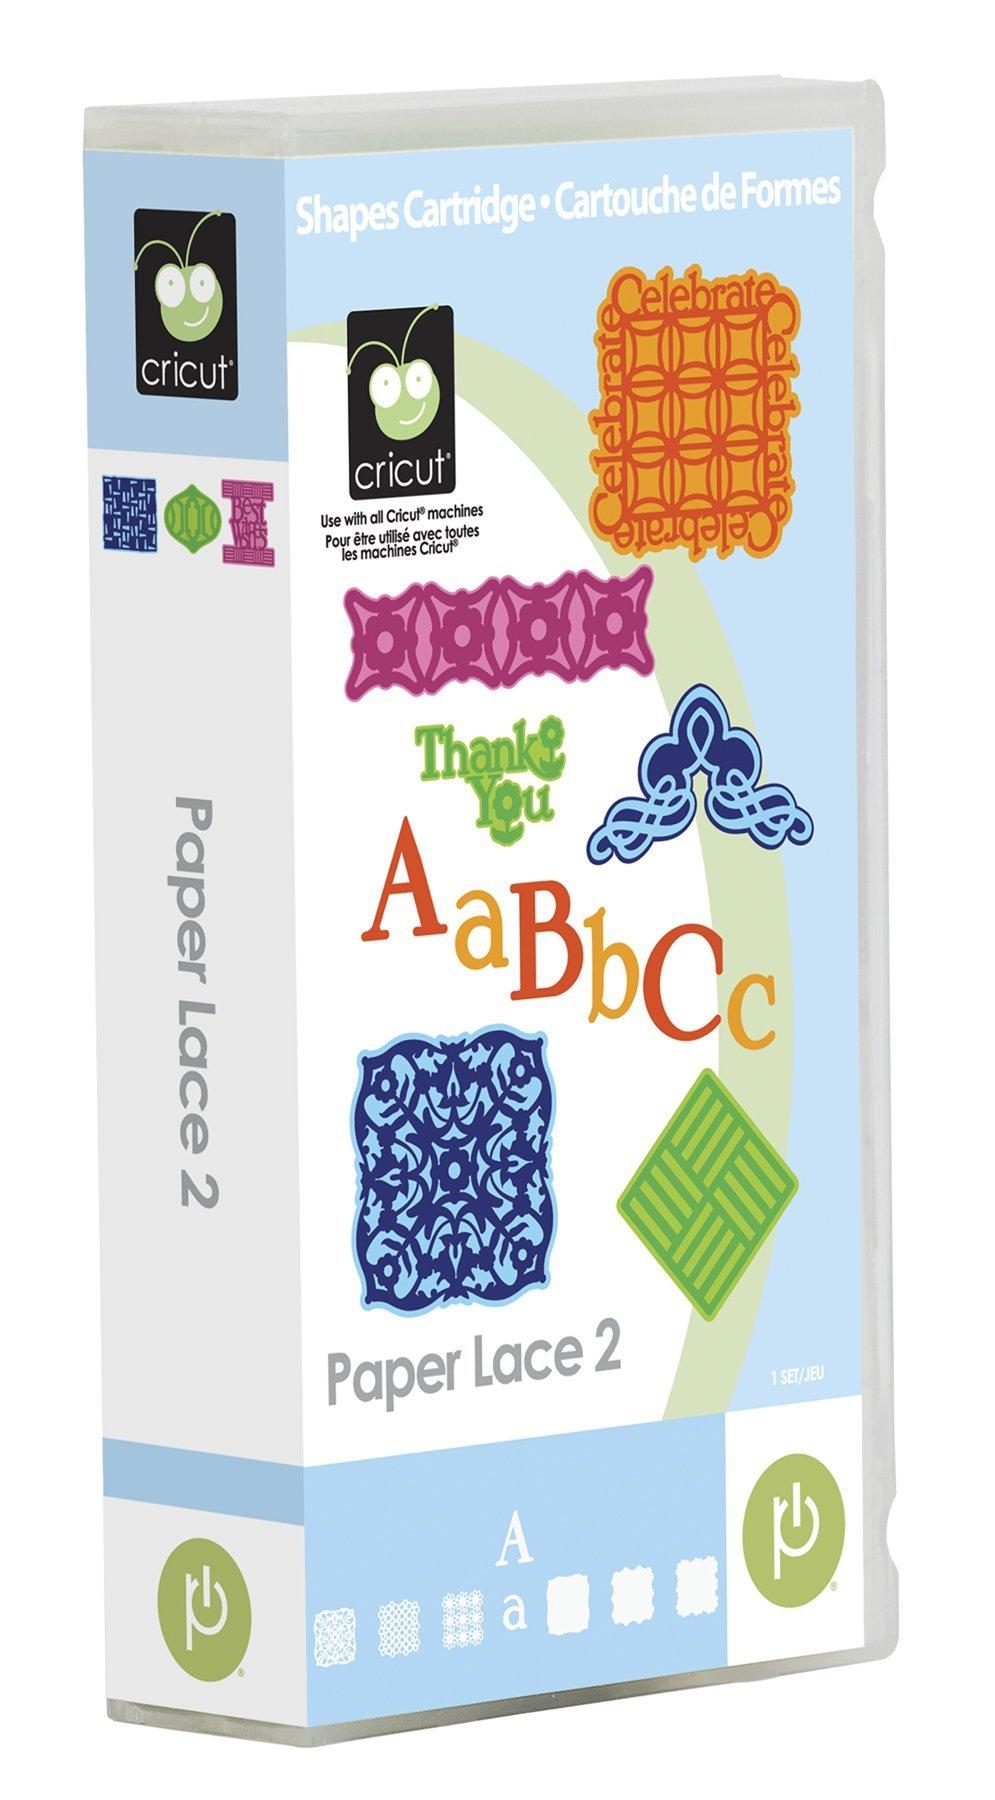 Cricut 2000941 Paper Lace 2 Cartridge